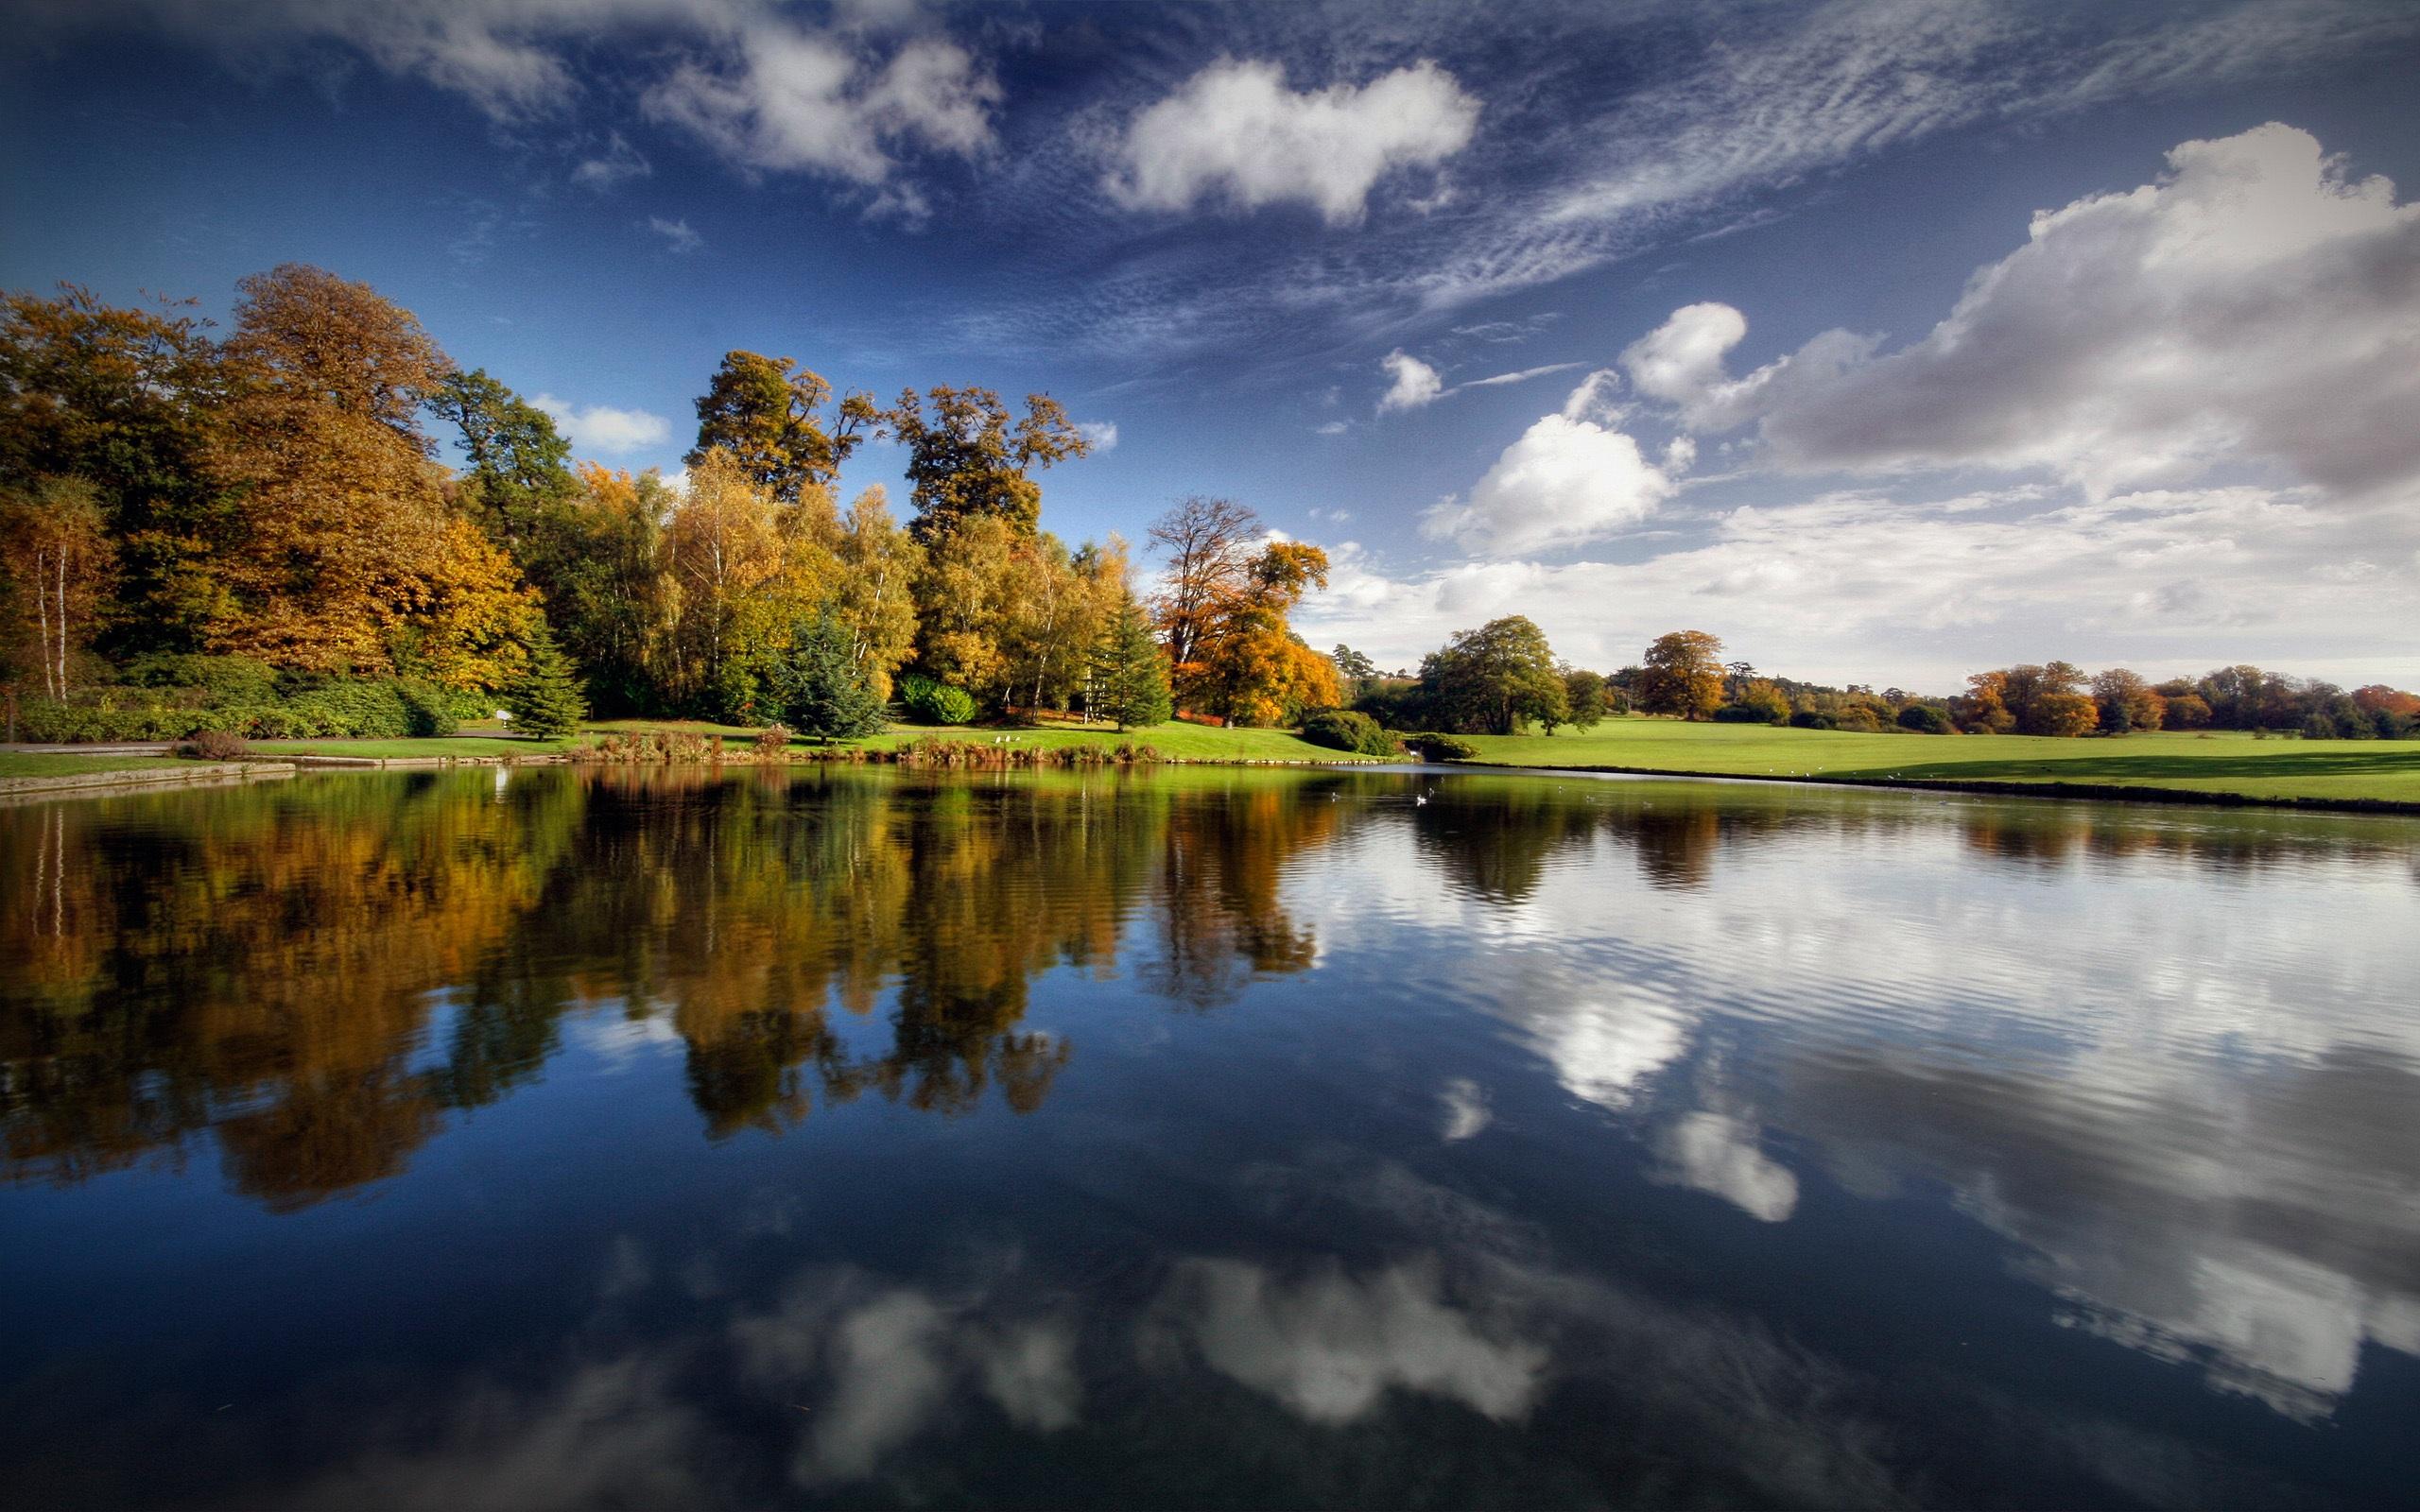 Calm-lake-scenery_2560x1600.jpg